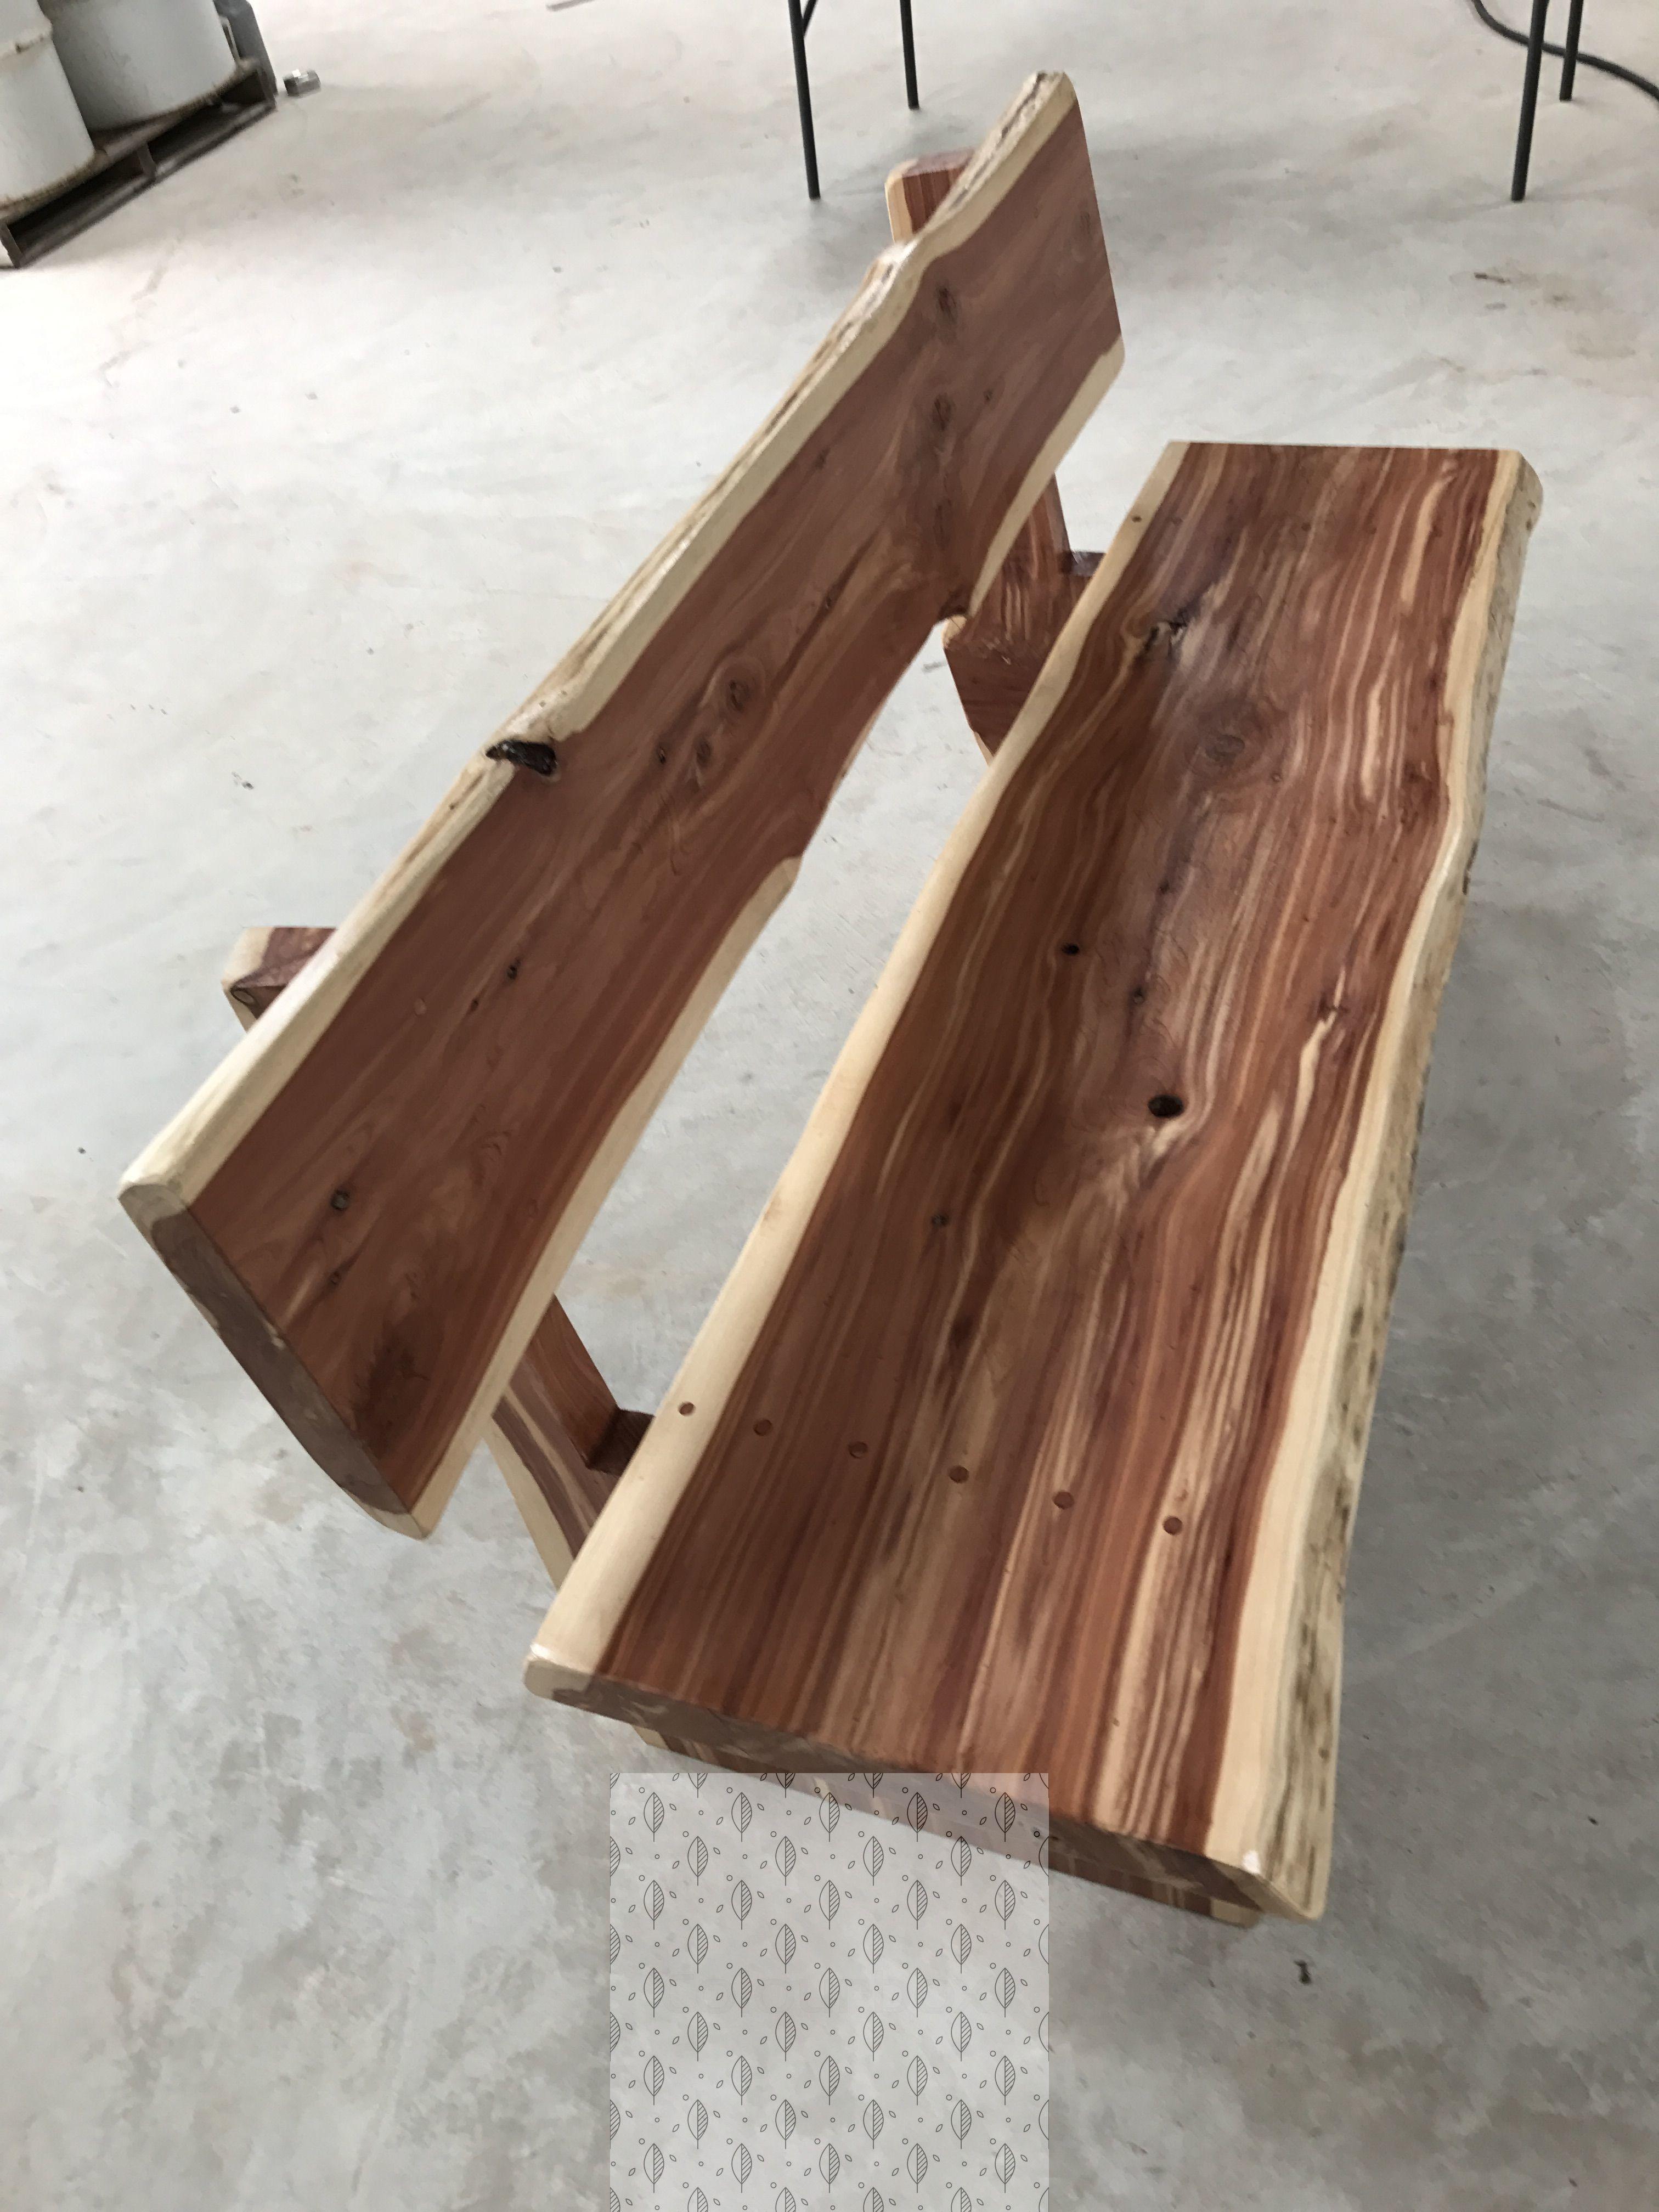 16 Awe Inspiring Wood Working Bench Decks Ideas In 2020 Cedar Furniture Cedar Wood Projects Woodworking Bench